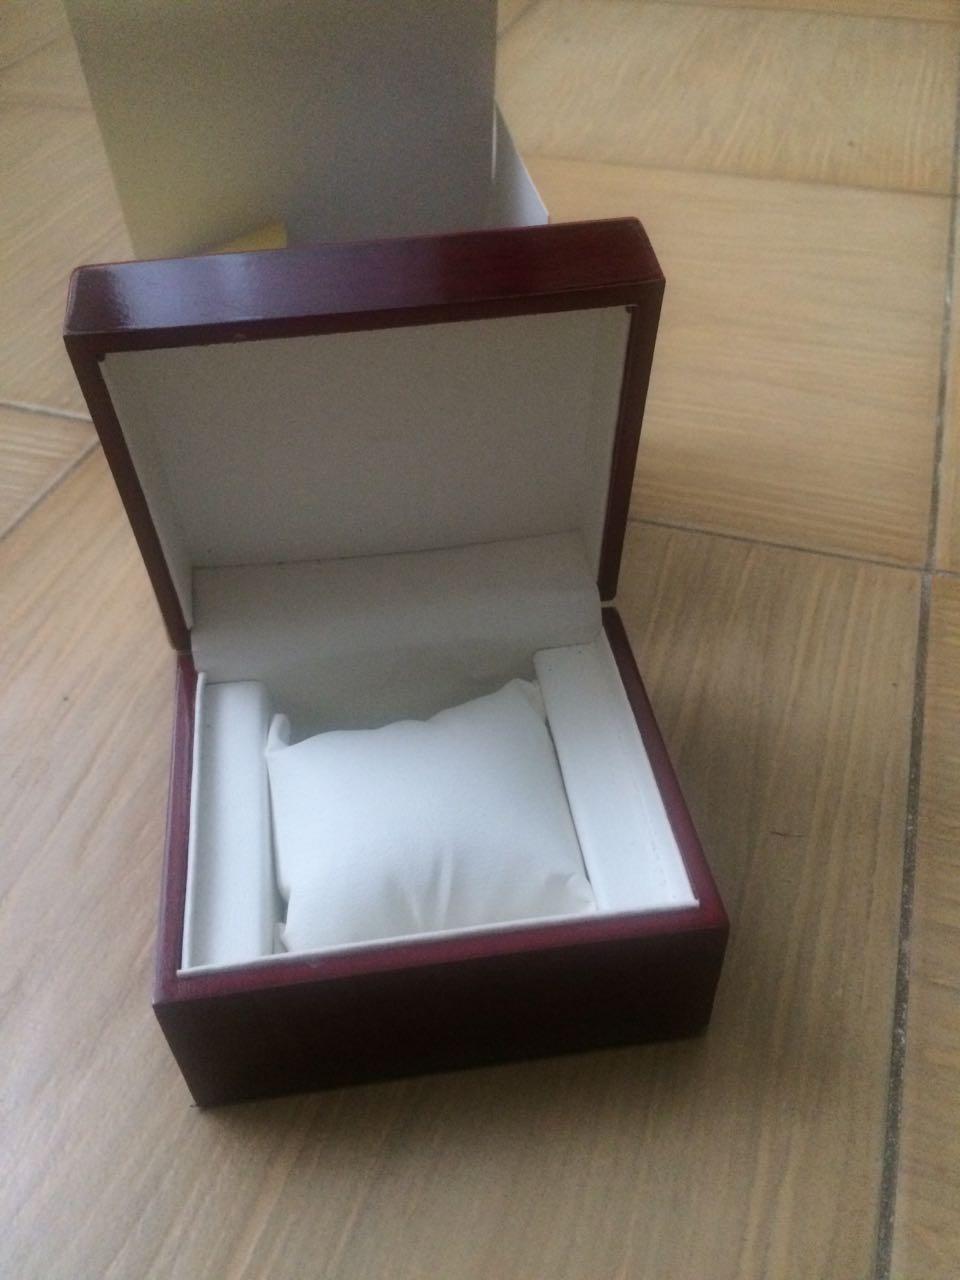 Коробка для часов красное дерево оптом - 1